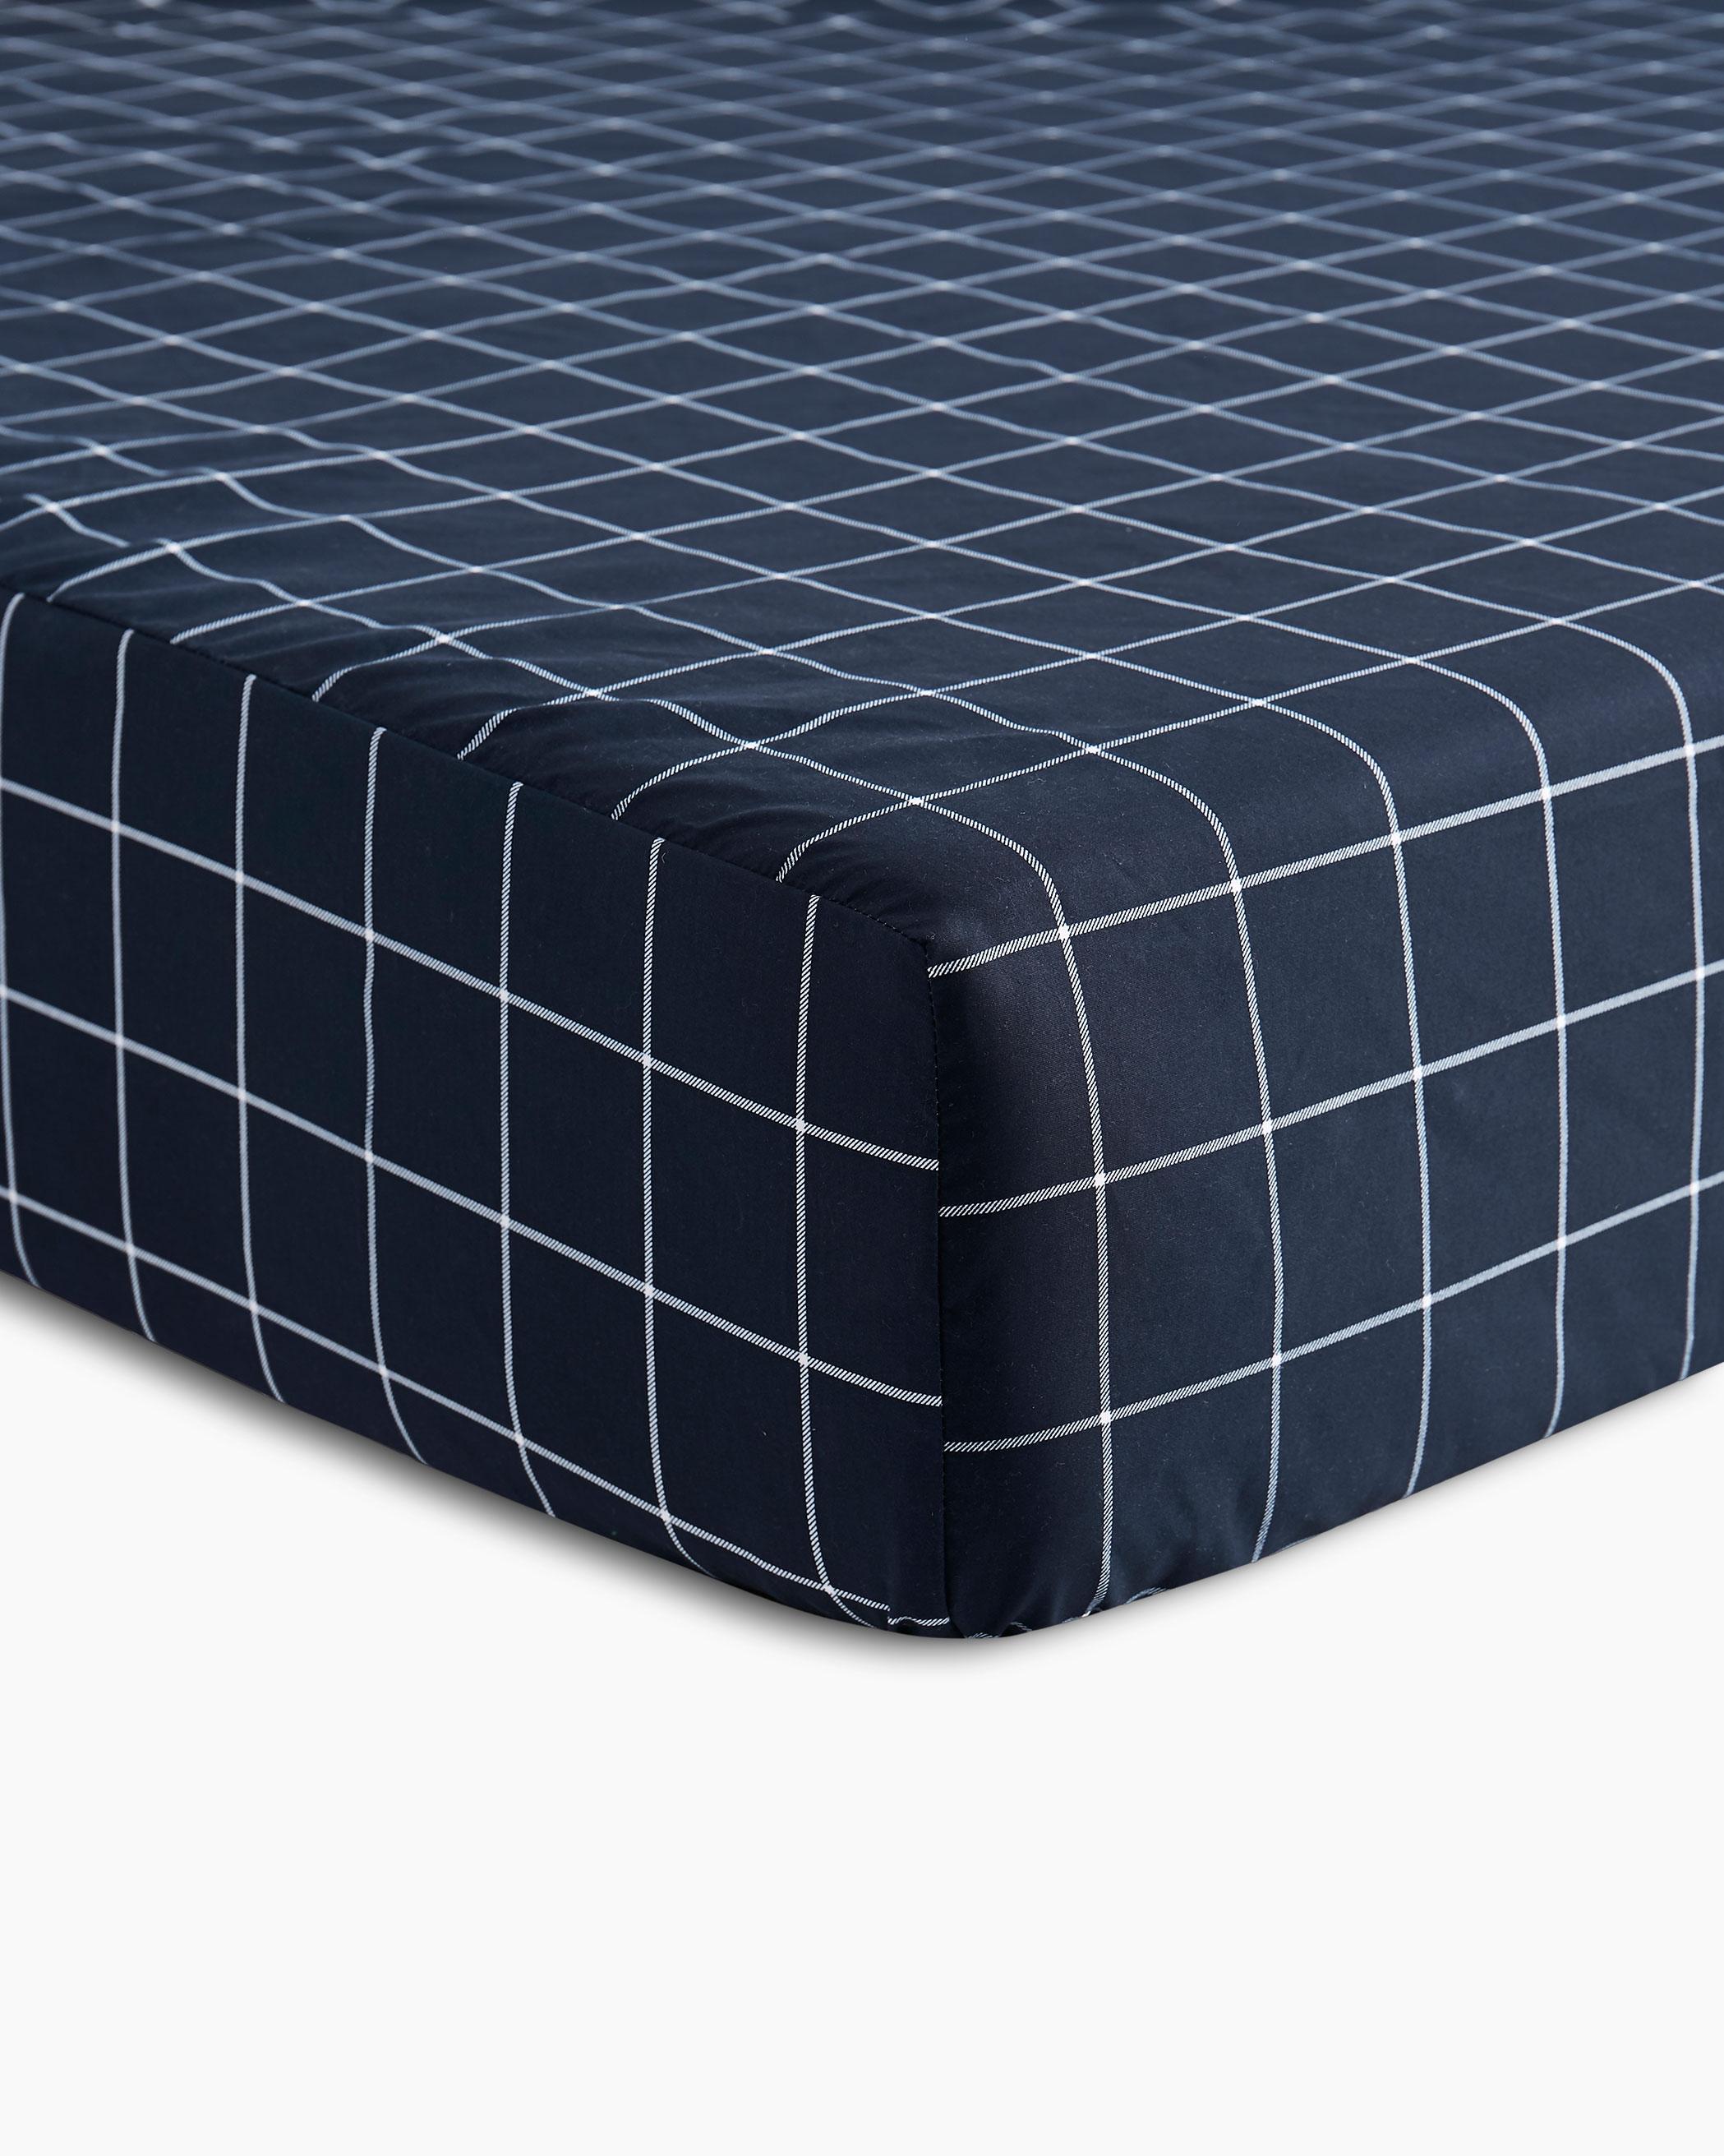 Navy Grid Microfiber Sheet Set